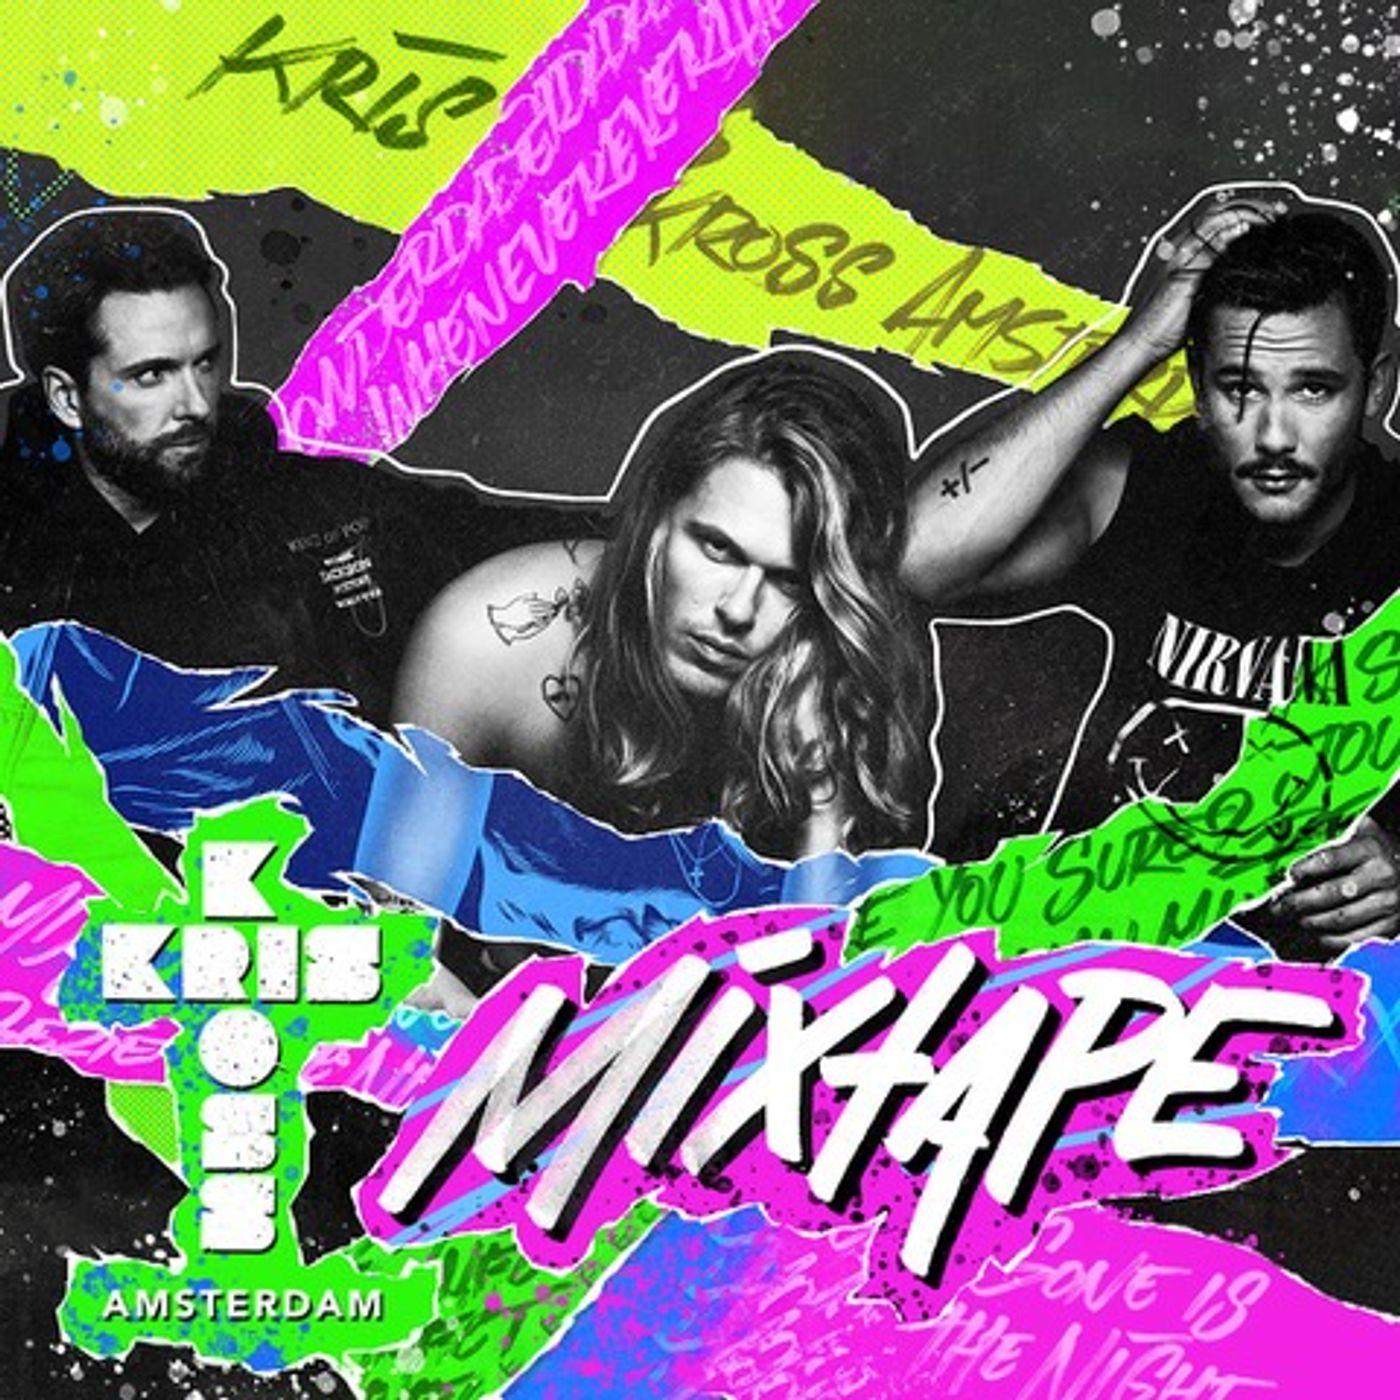 Kris Kross Amsterdam | Kris Kross Mixtape #121